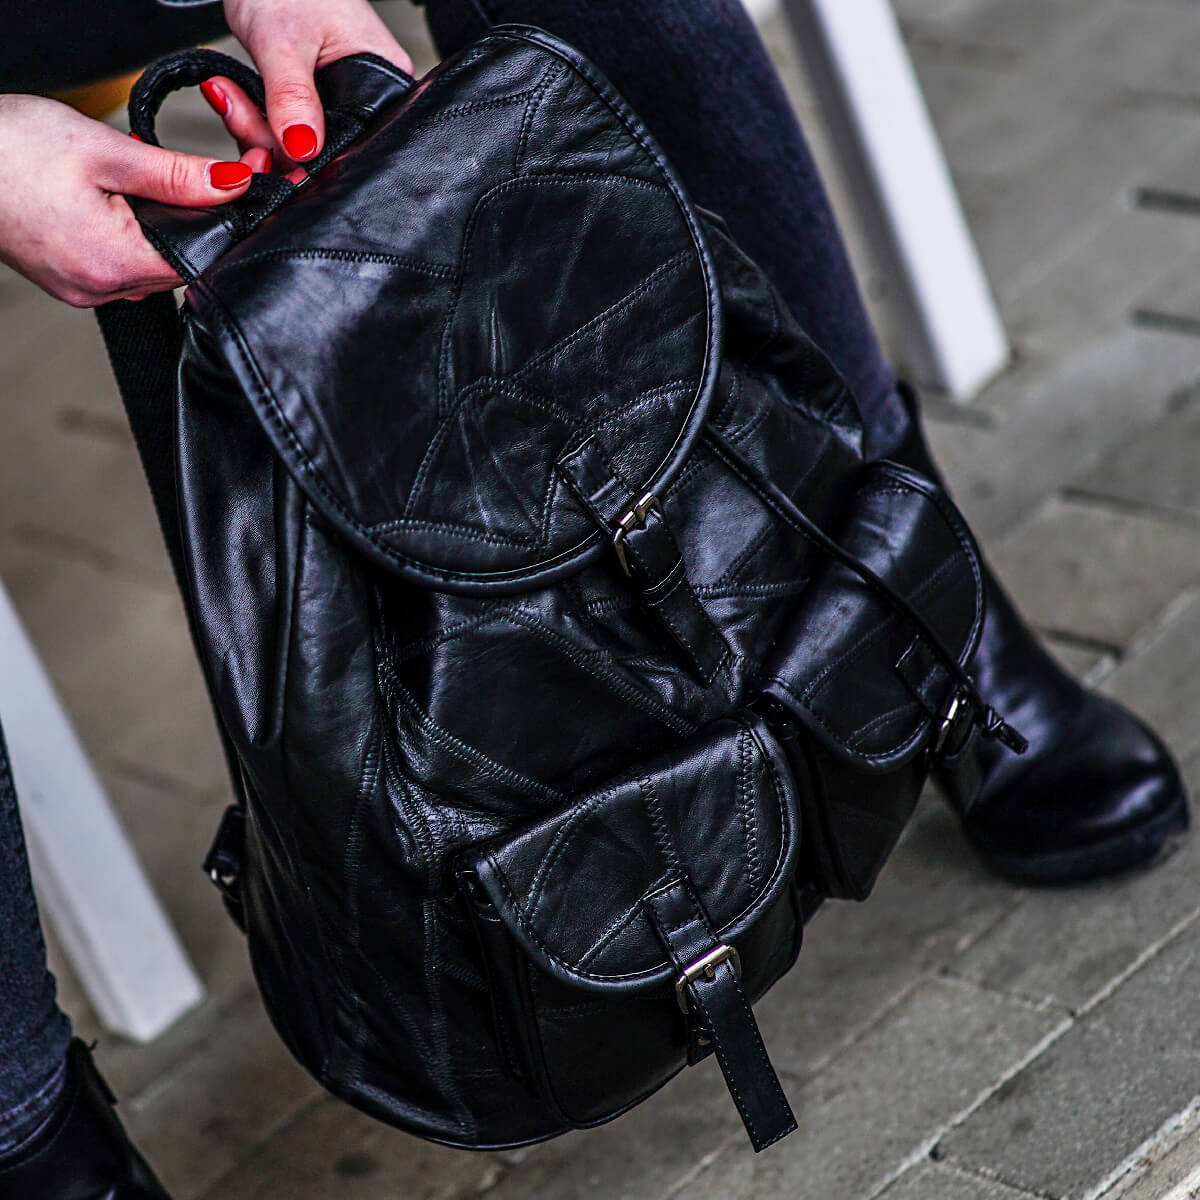 01787cef9856f plecaki skórzane damskie · czarny plecak · plecak skórzany damski · plecak  skórzany ...